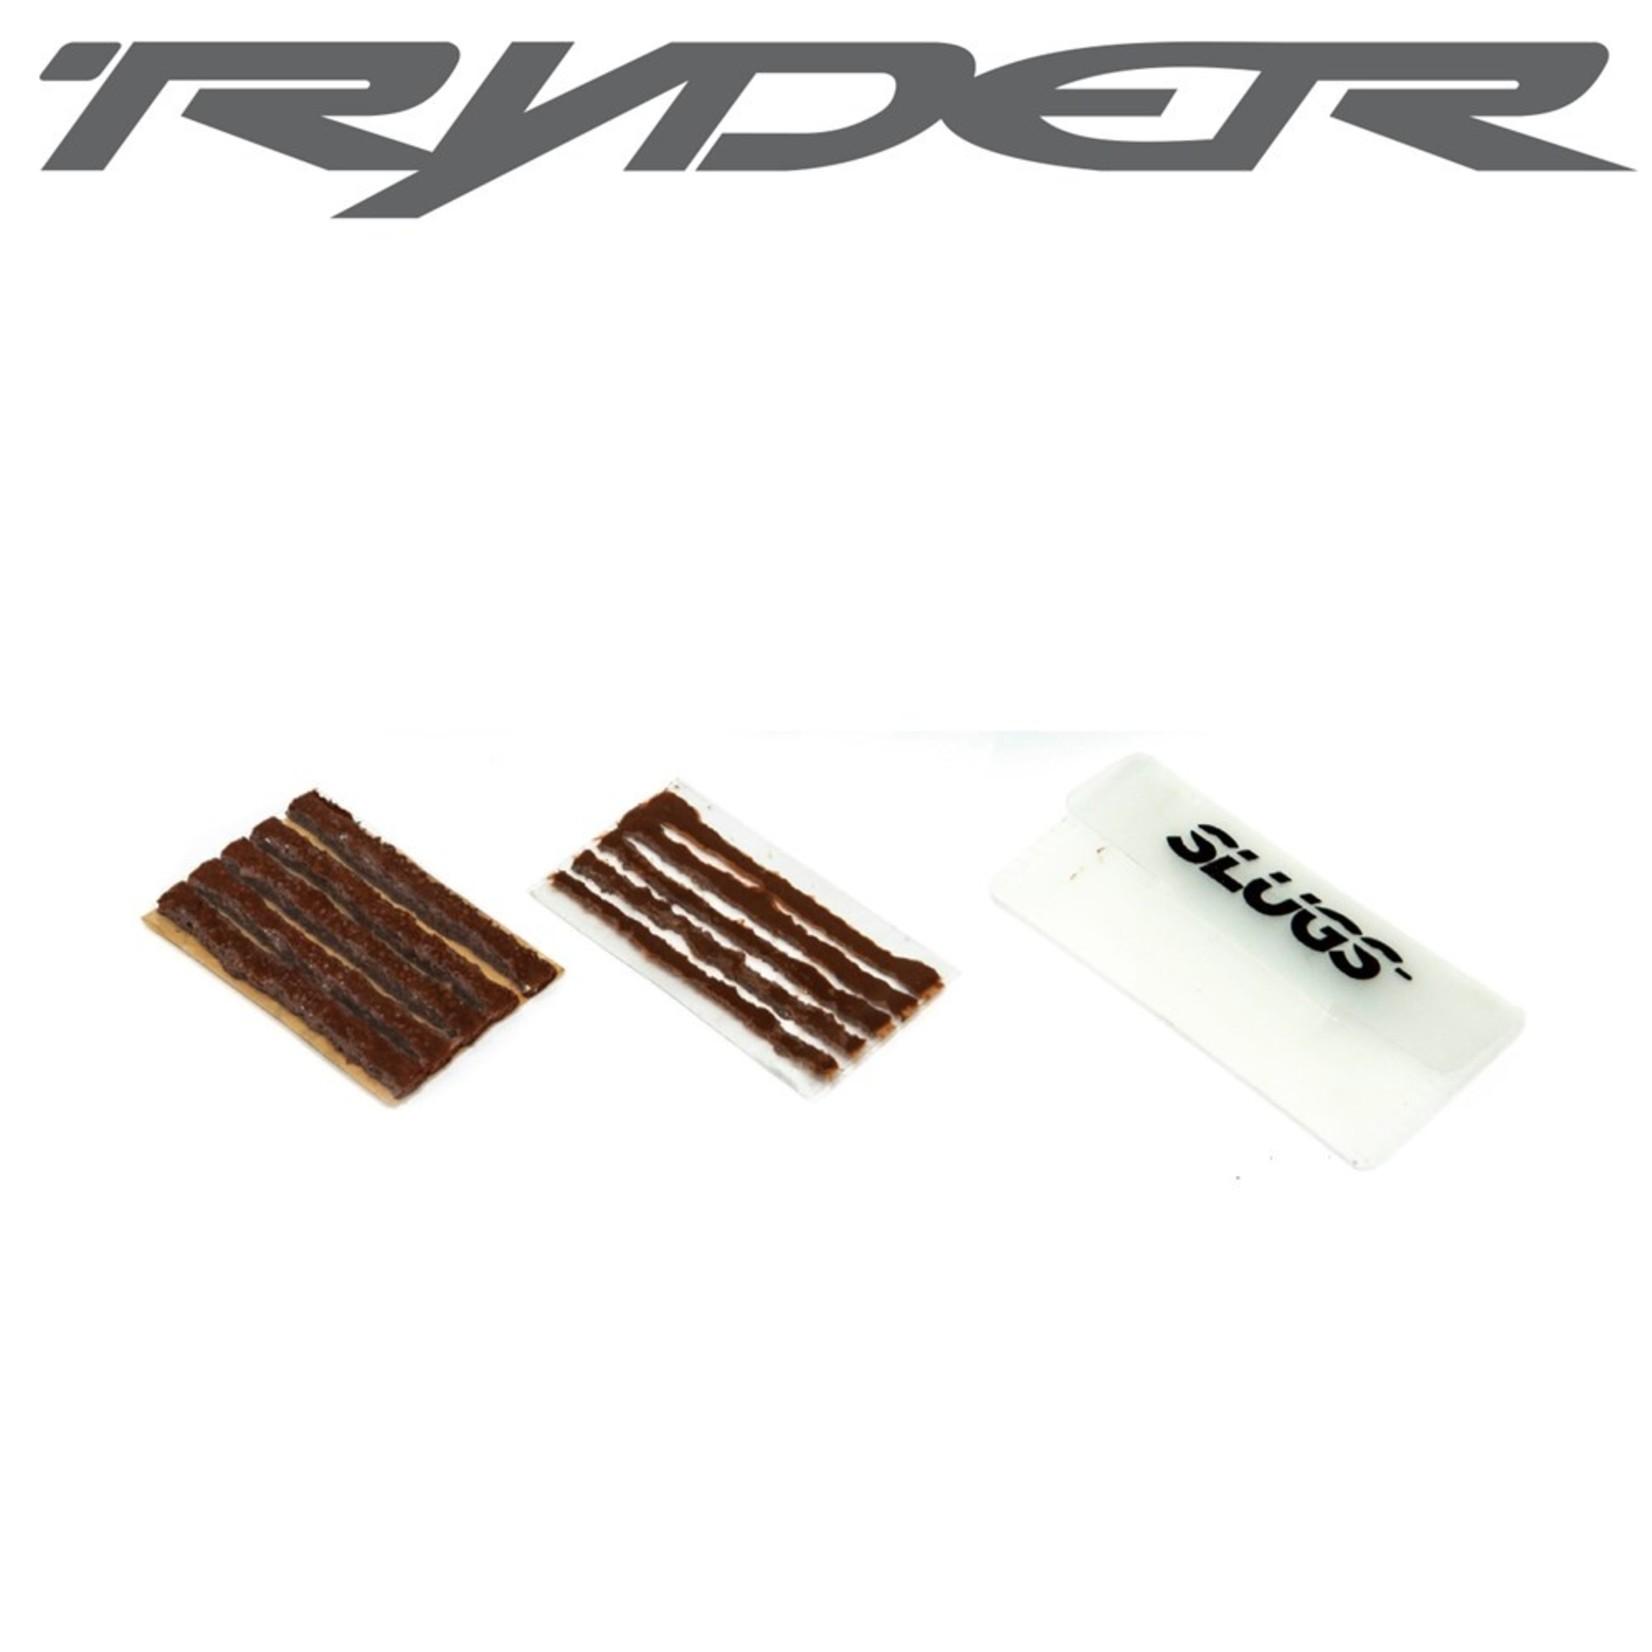 Ryder Ryder, Slug Plug Slug Envelope